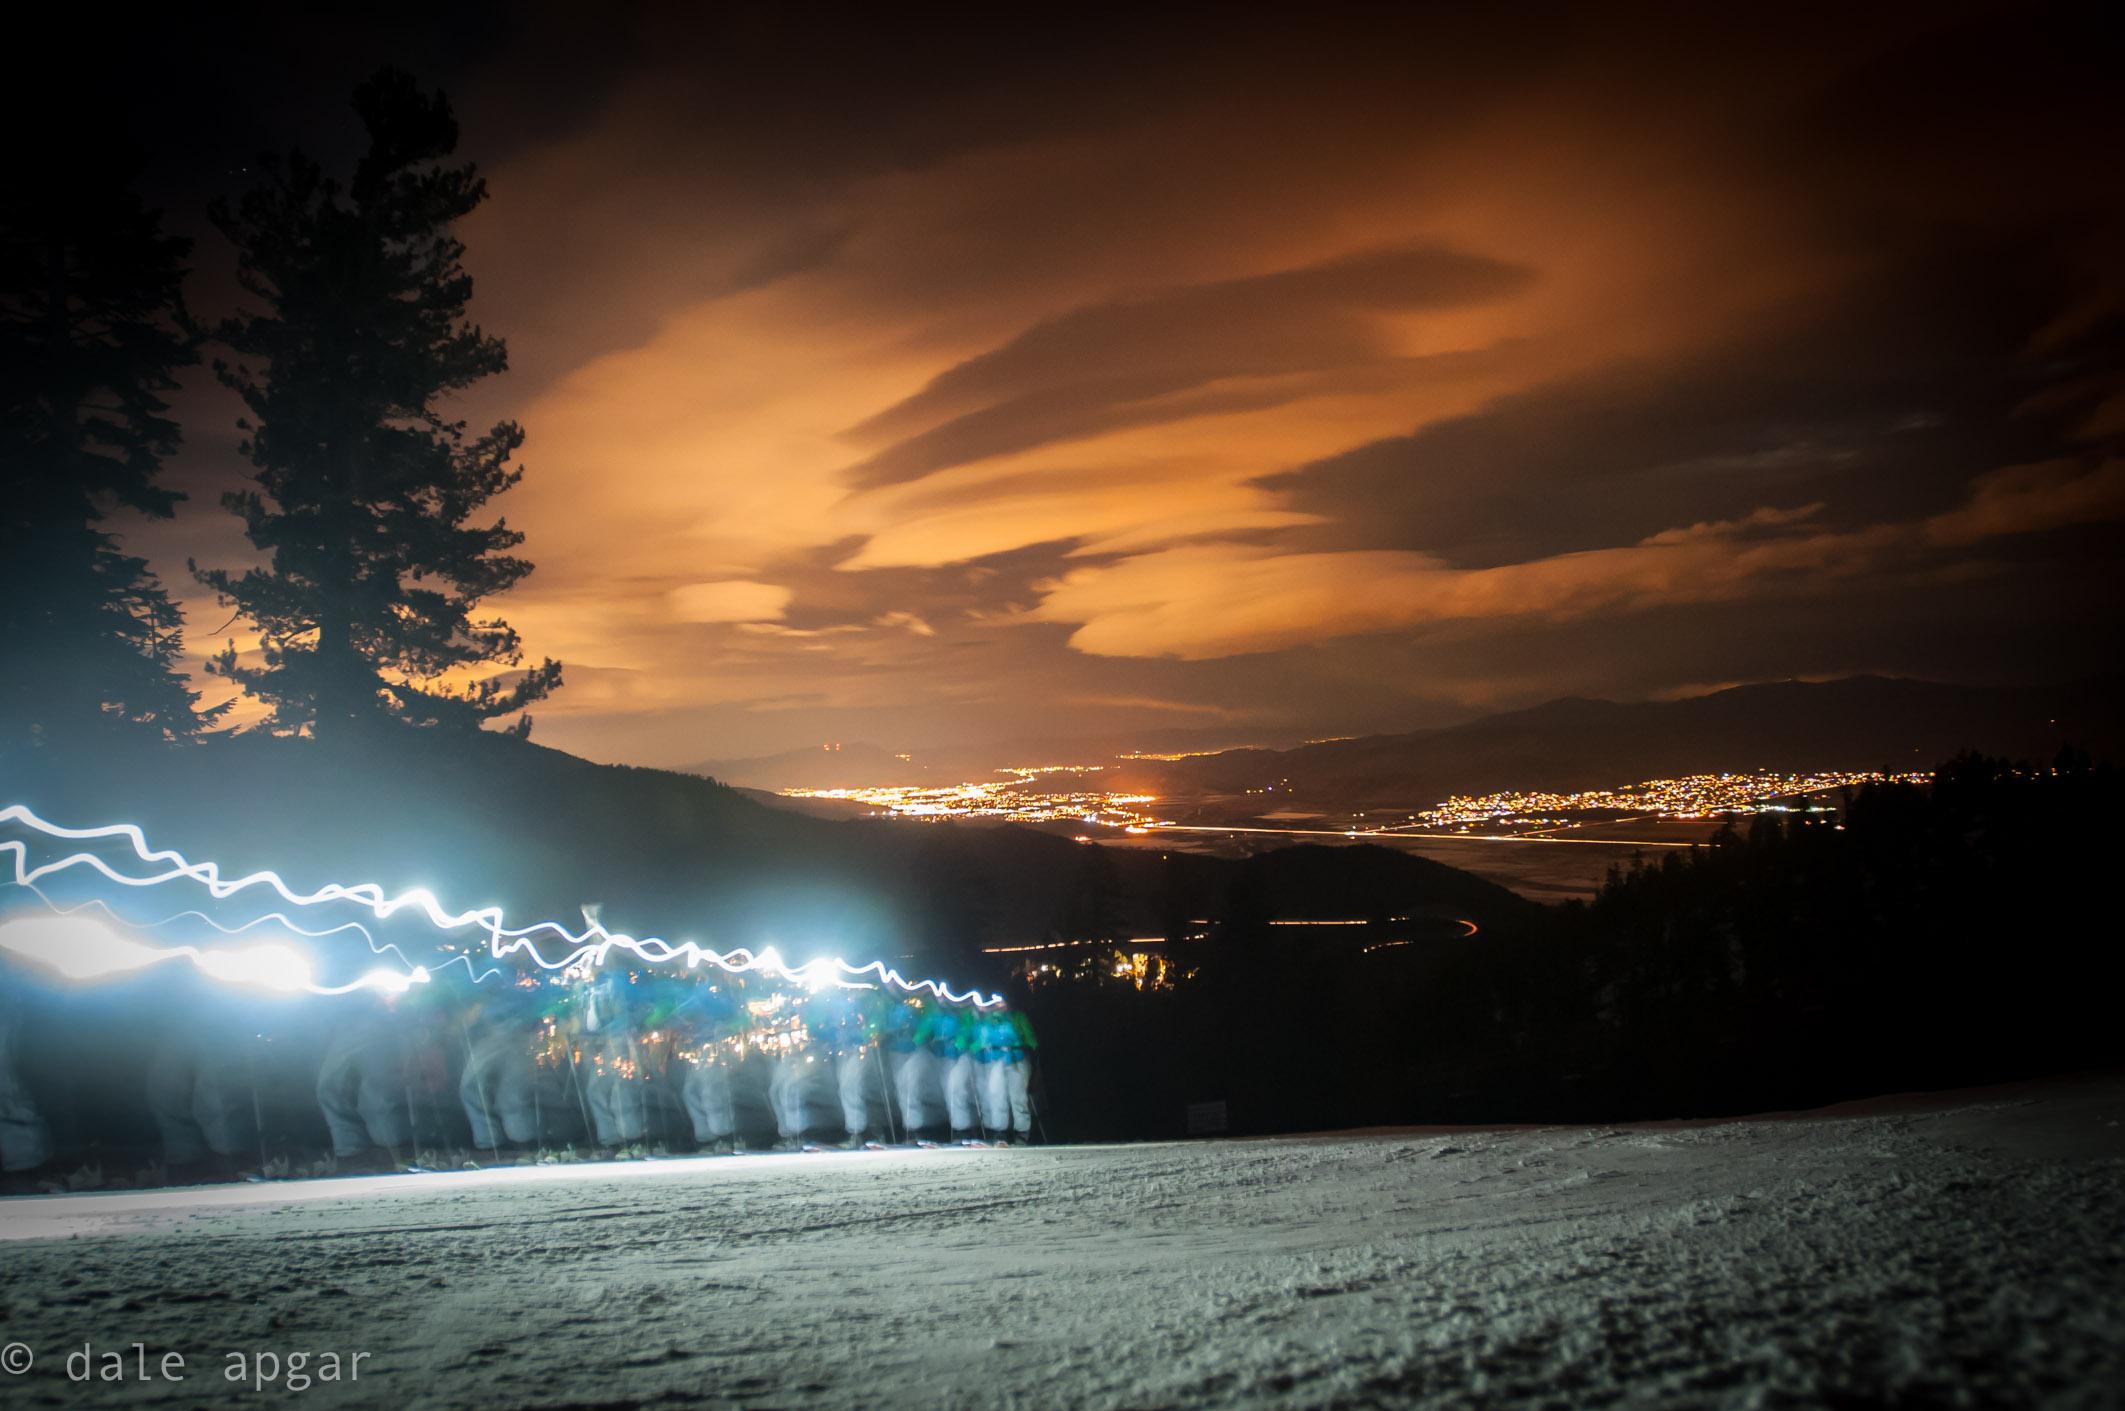 dale_apgar_ski-32.jpg